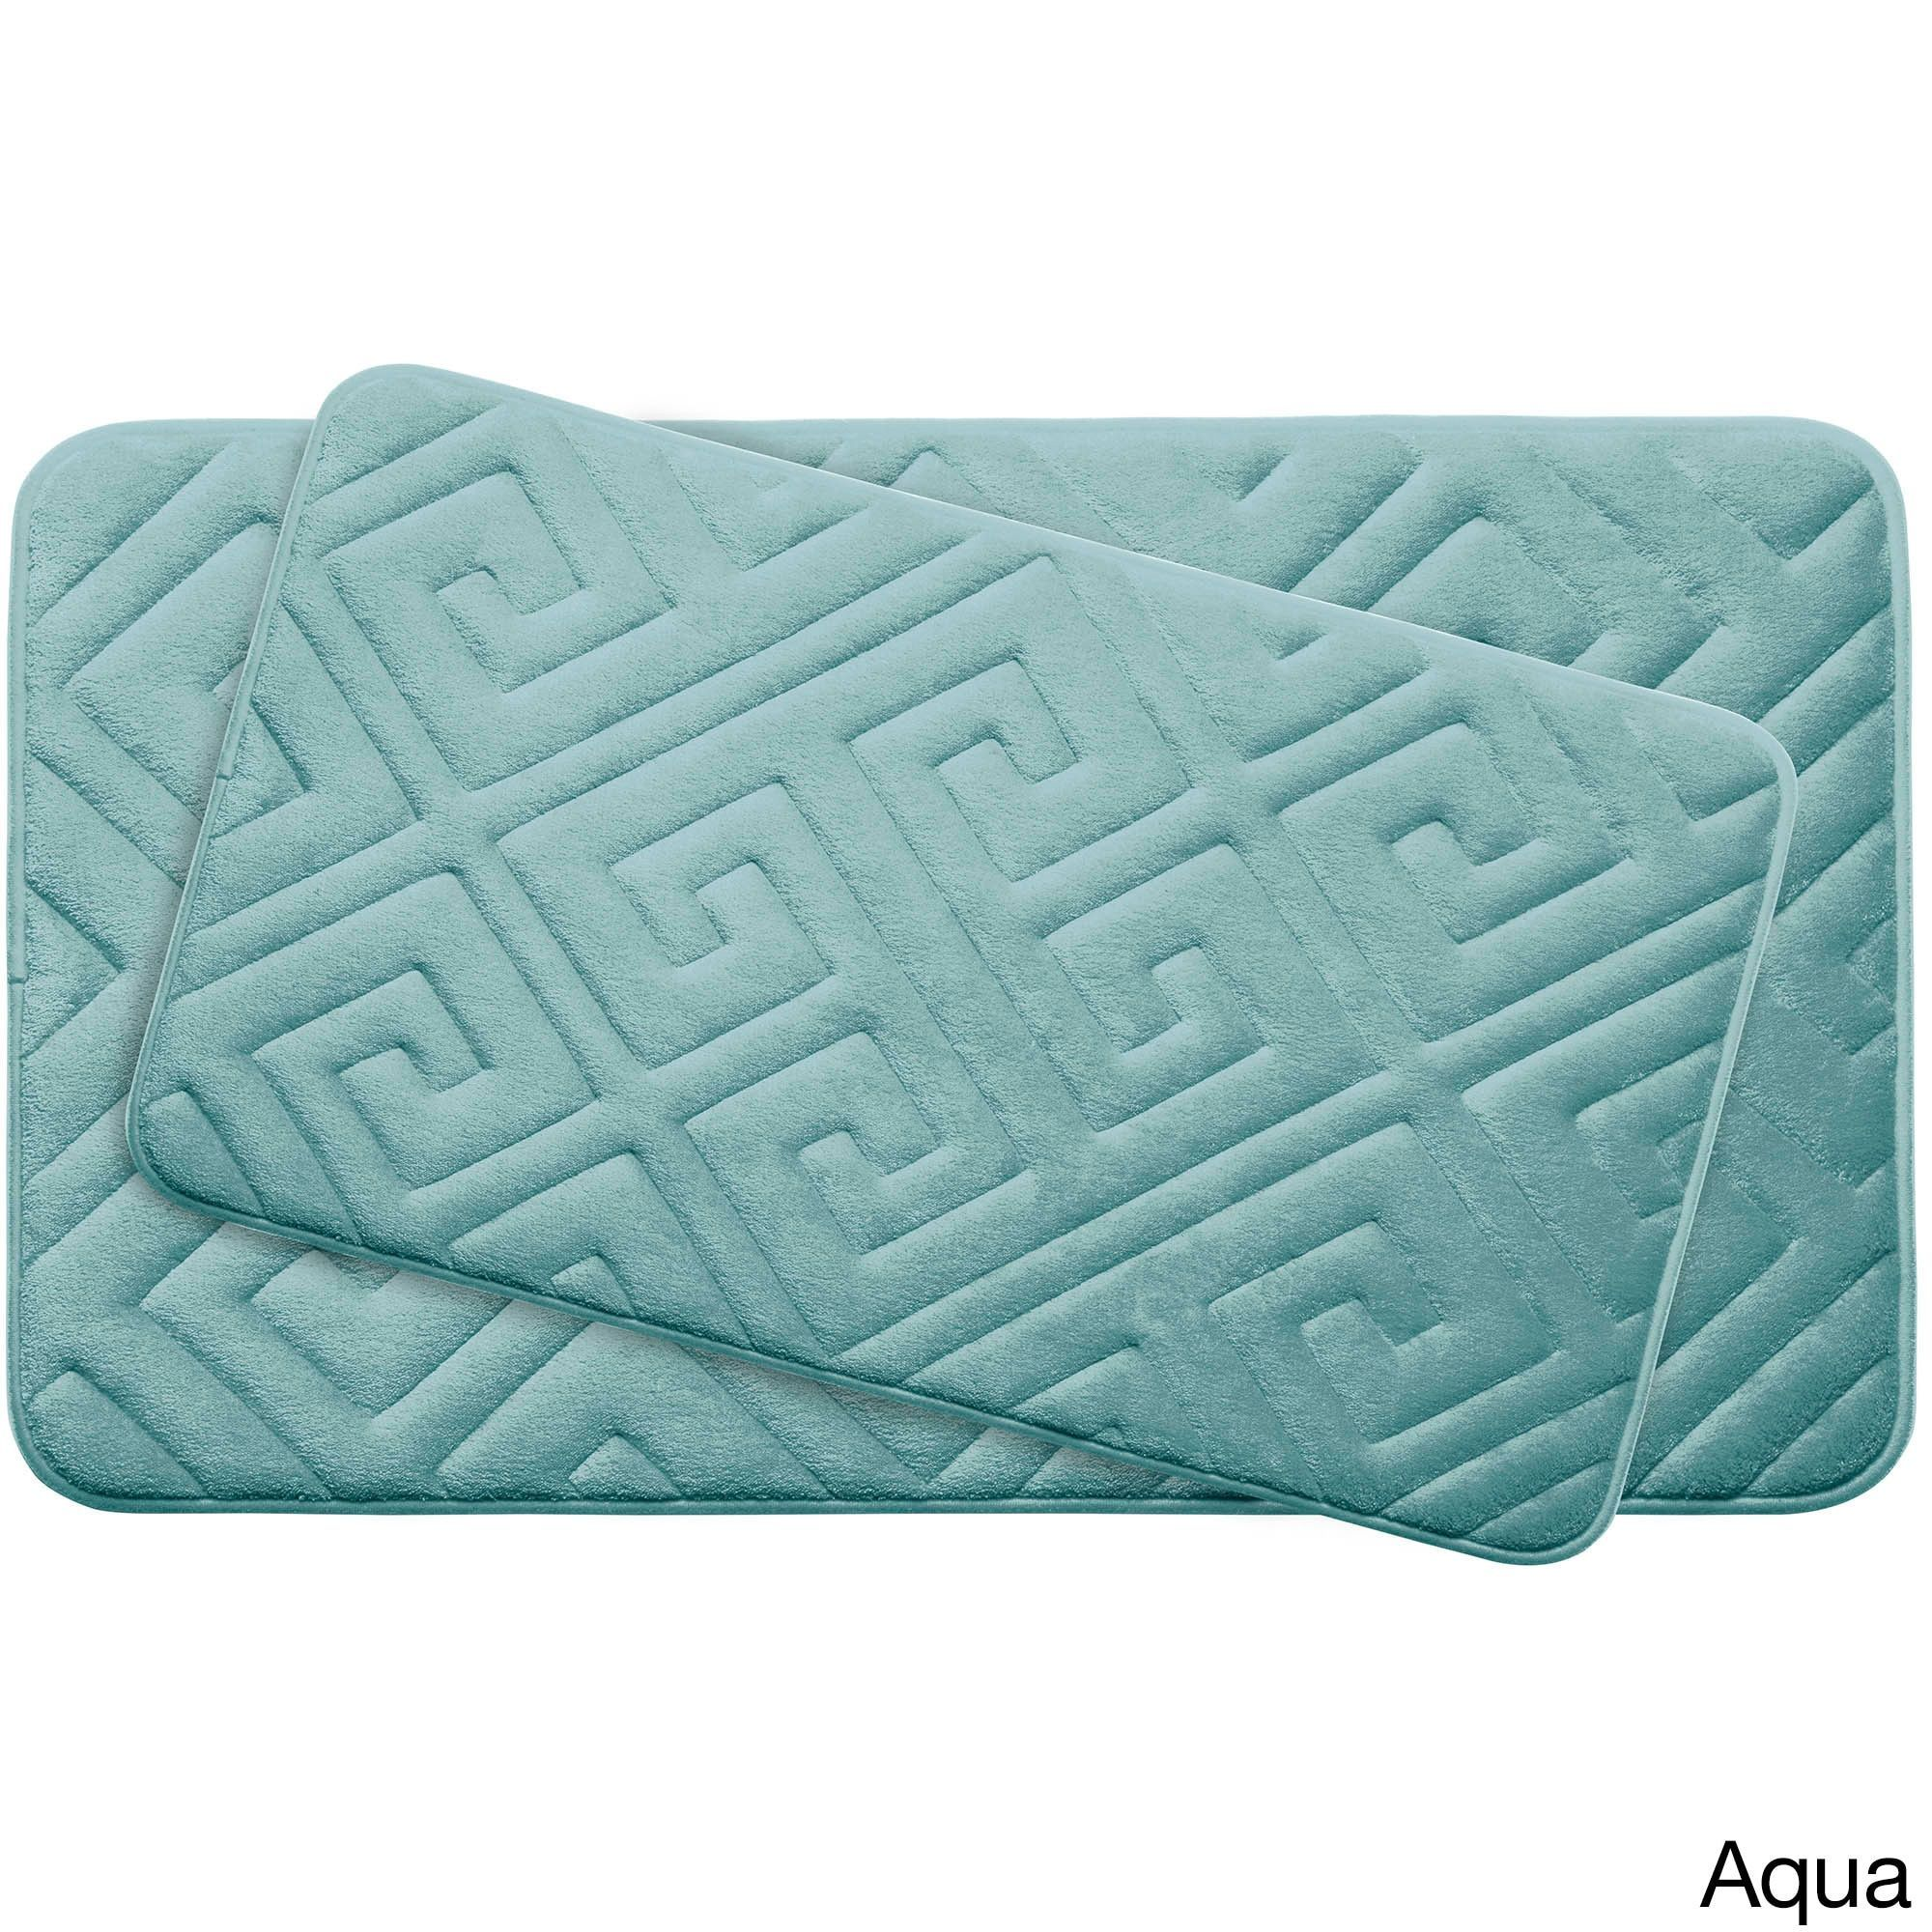 Caicos Memory Foam 2 Piece Bath Mat Set W Bouncecomfort